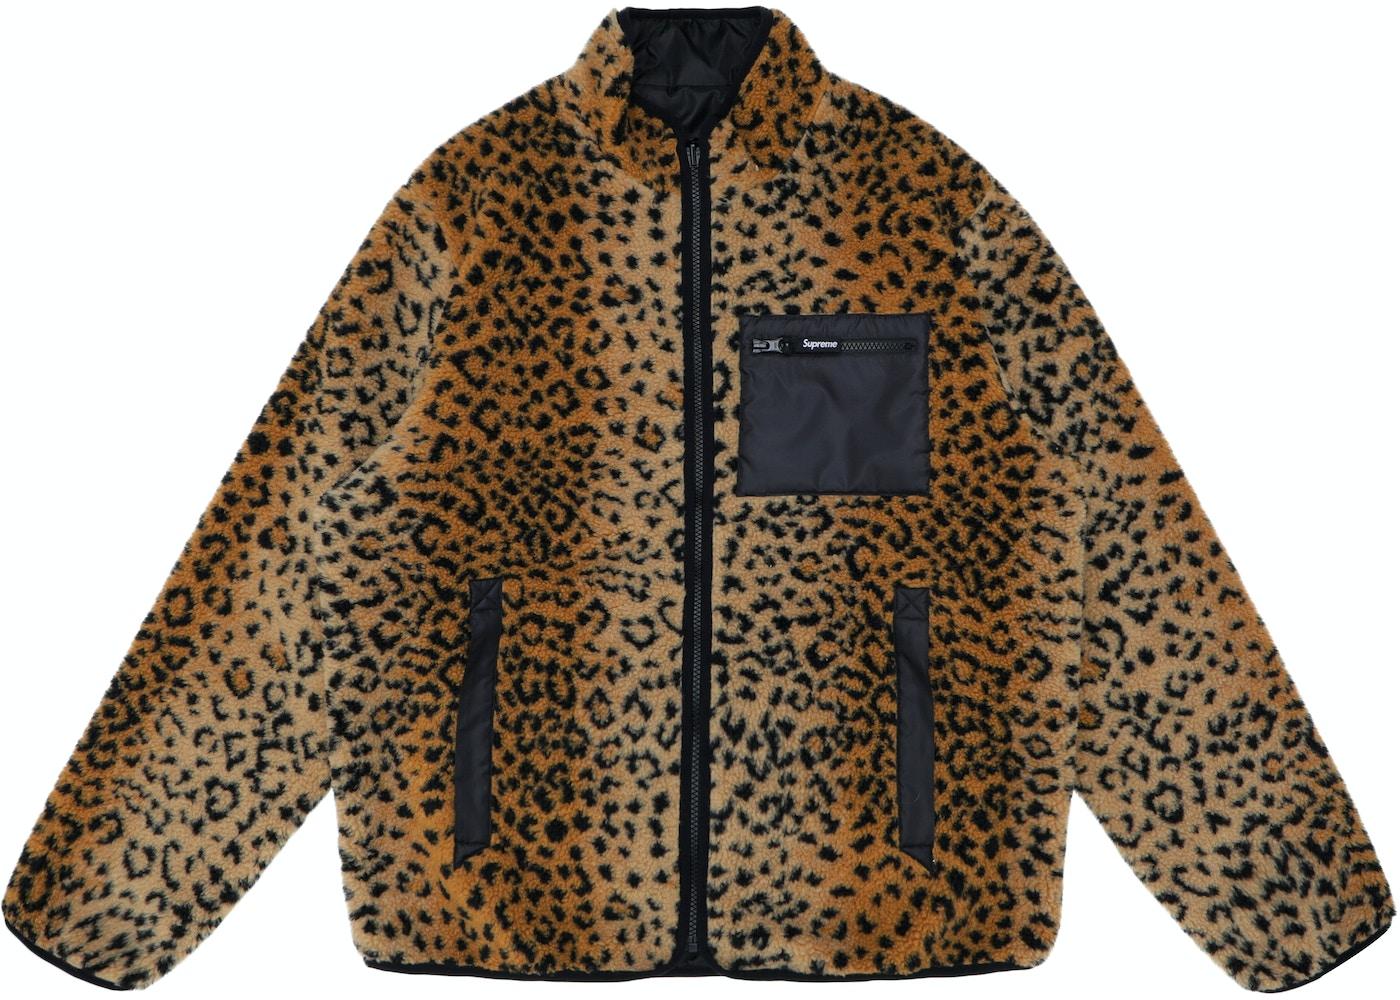 6d2aca0c5051 Streetwear - Supreme Jackets - Price Premium